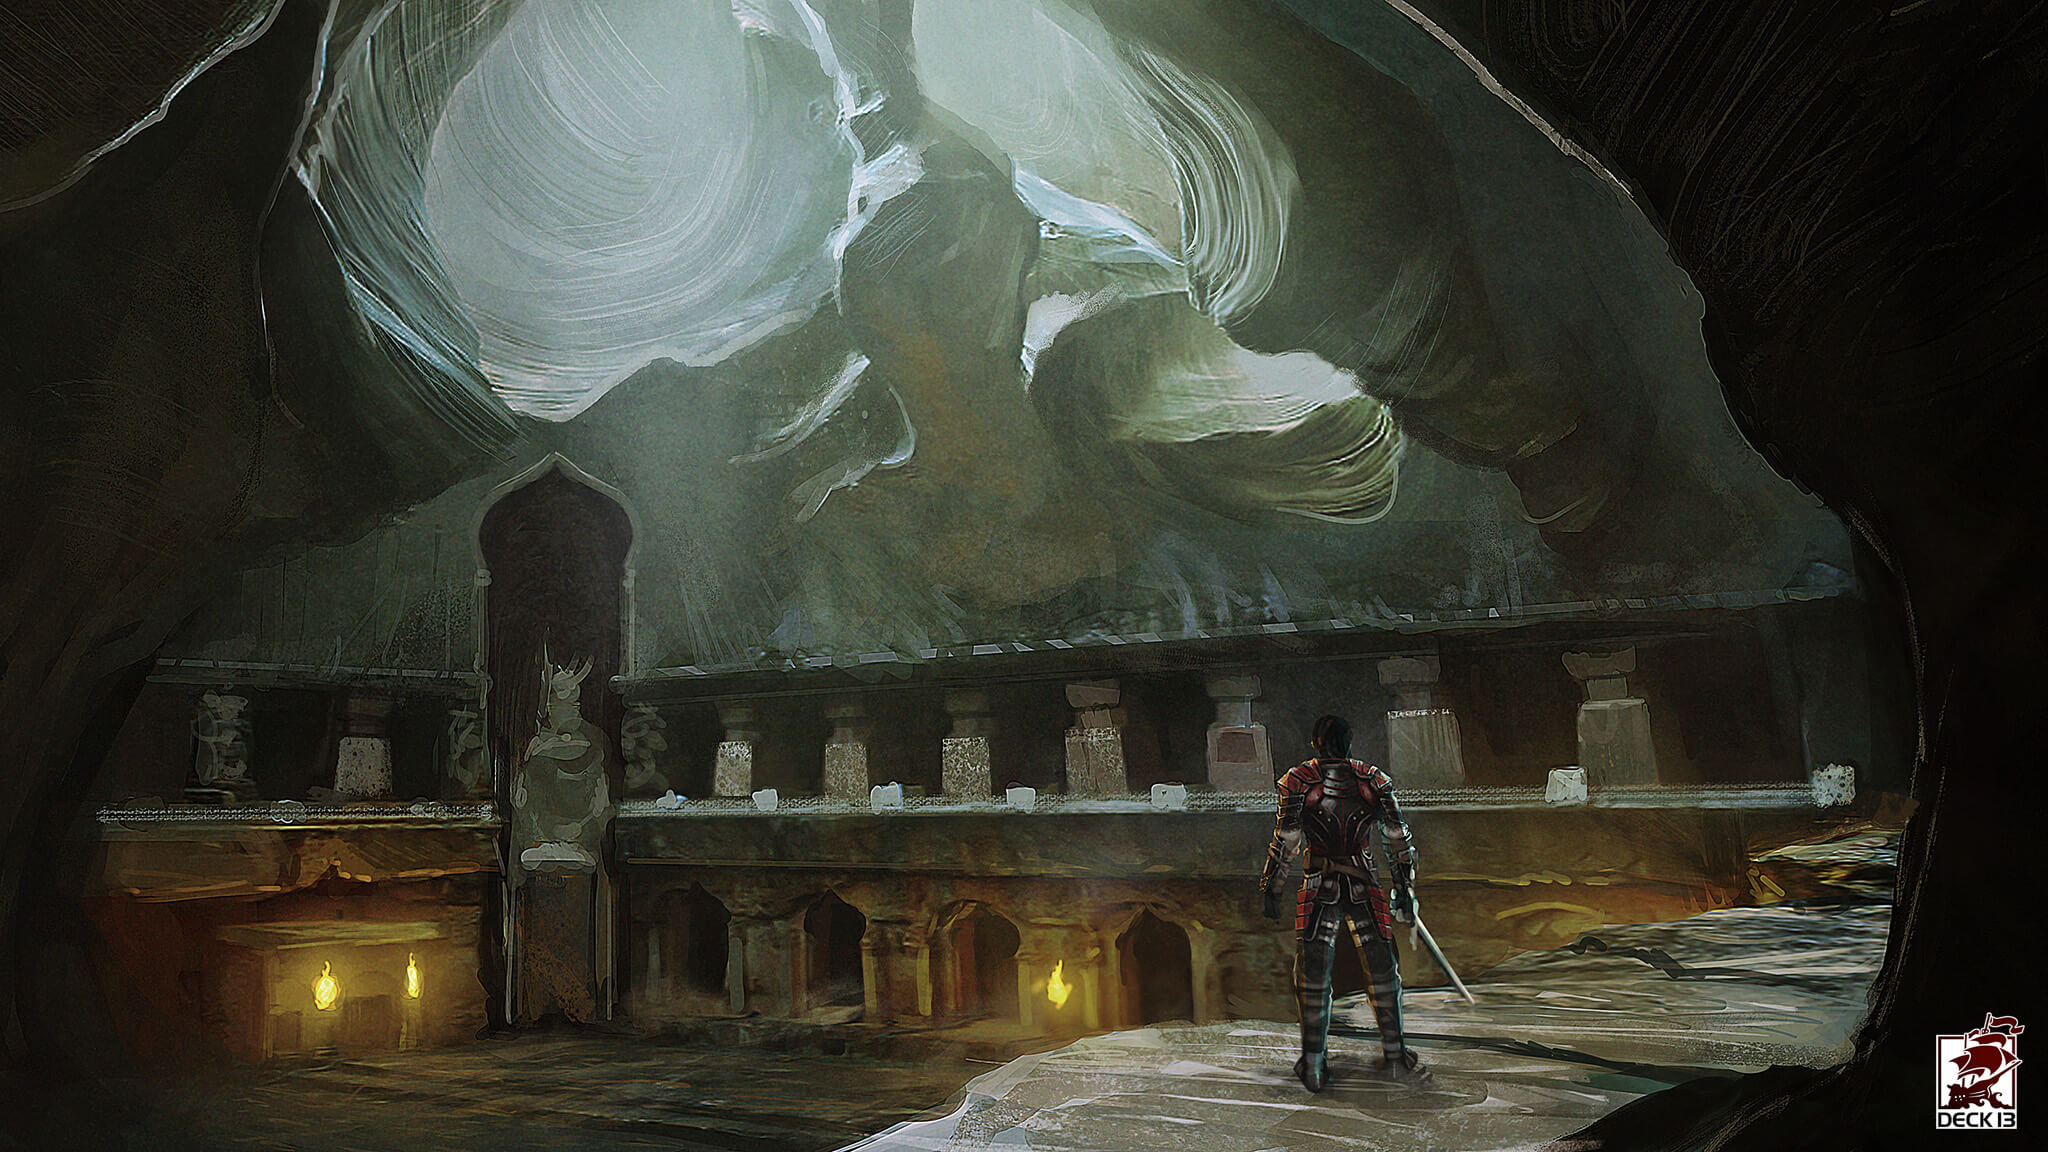 blood-knights-concept-art-felix-haas-holy-land-004